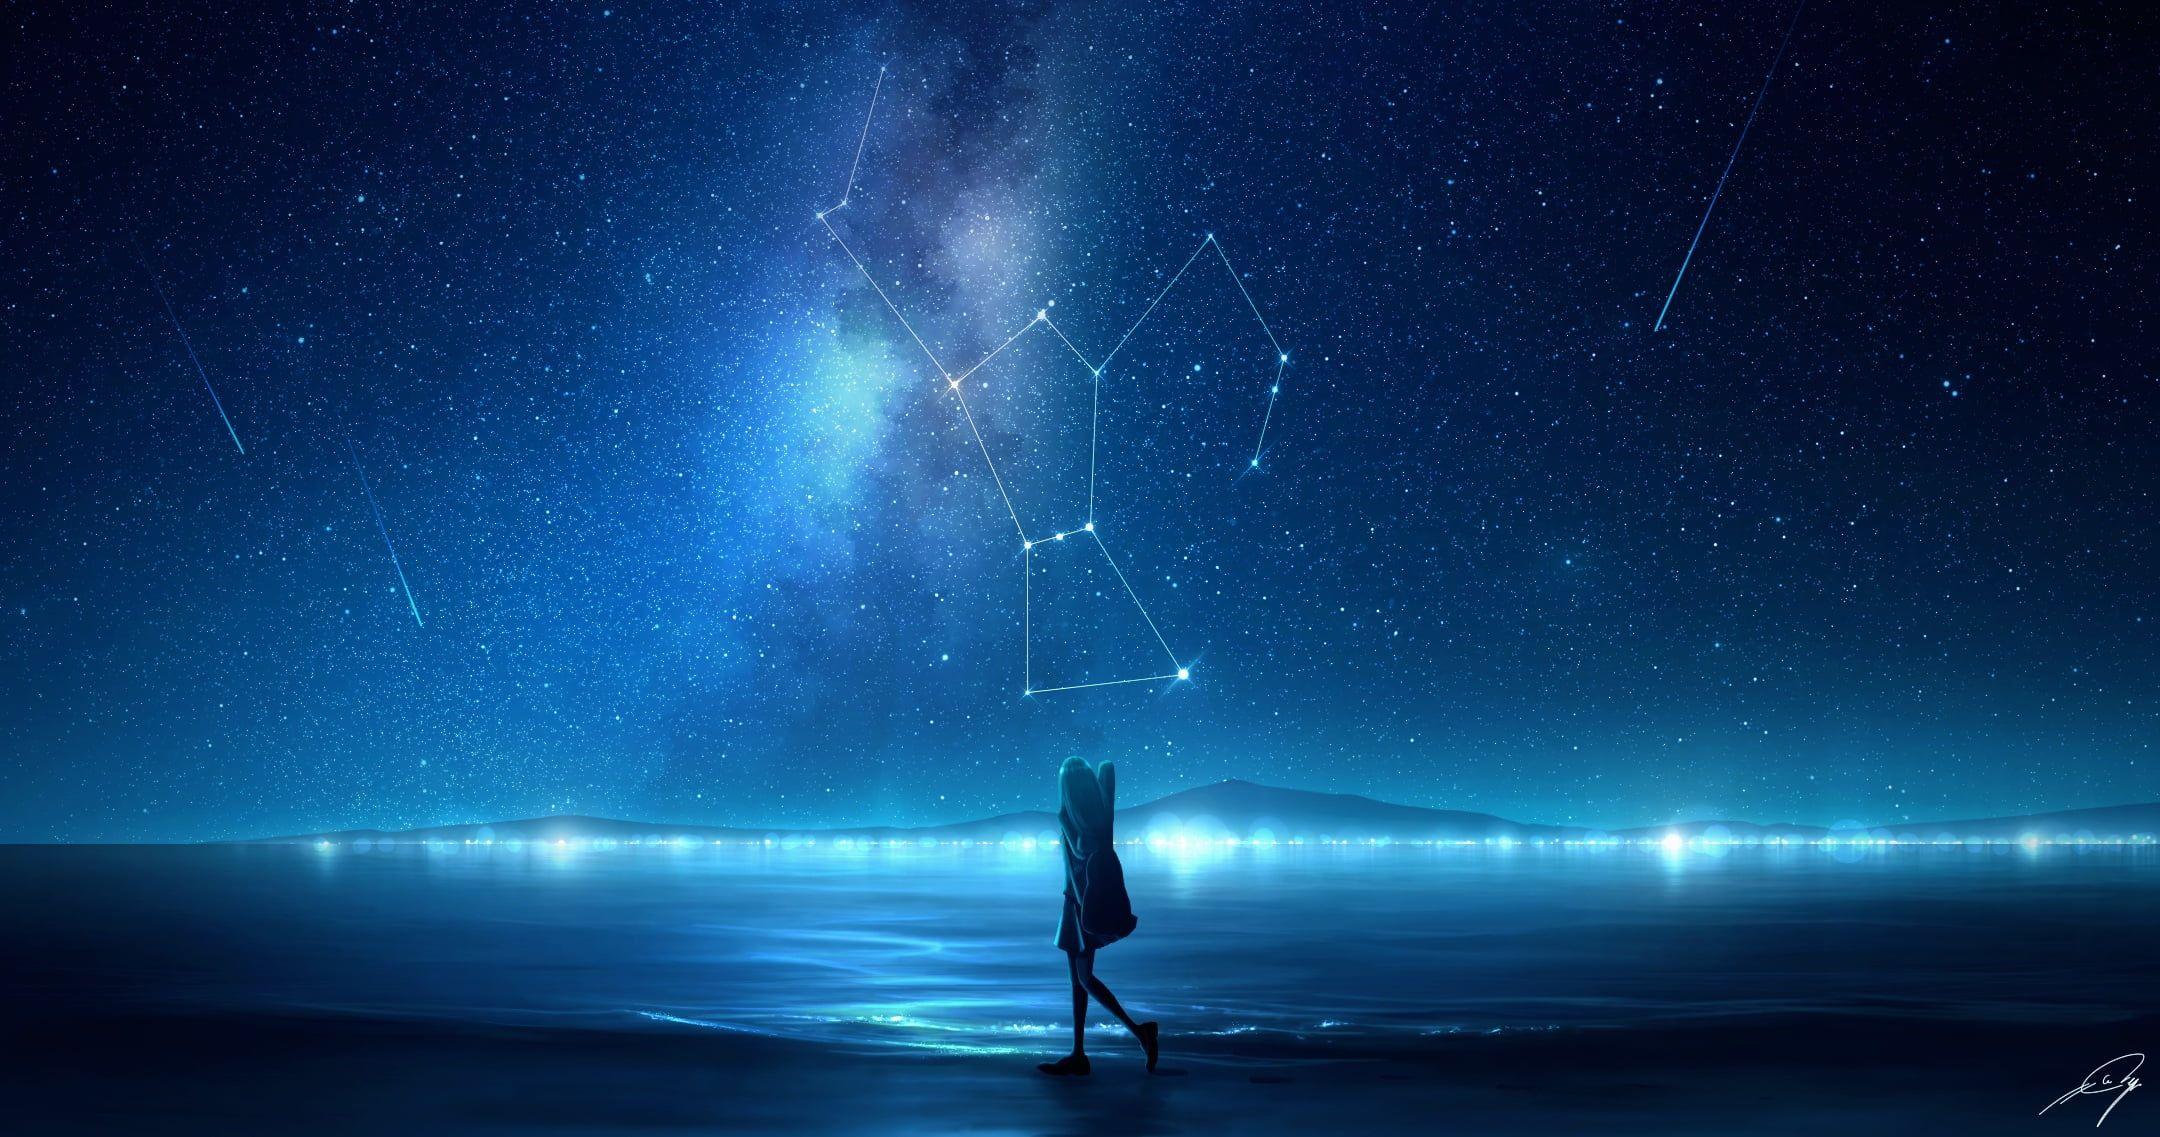 Anime Anime Girls Digital Digital Art Artwork Night Anime Sky Sky Stars Starry Night Lights Milky Way Sky Night Sky Wallpaper Sky Anime Anime Wallpaper